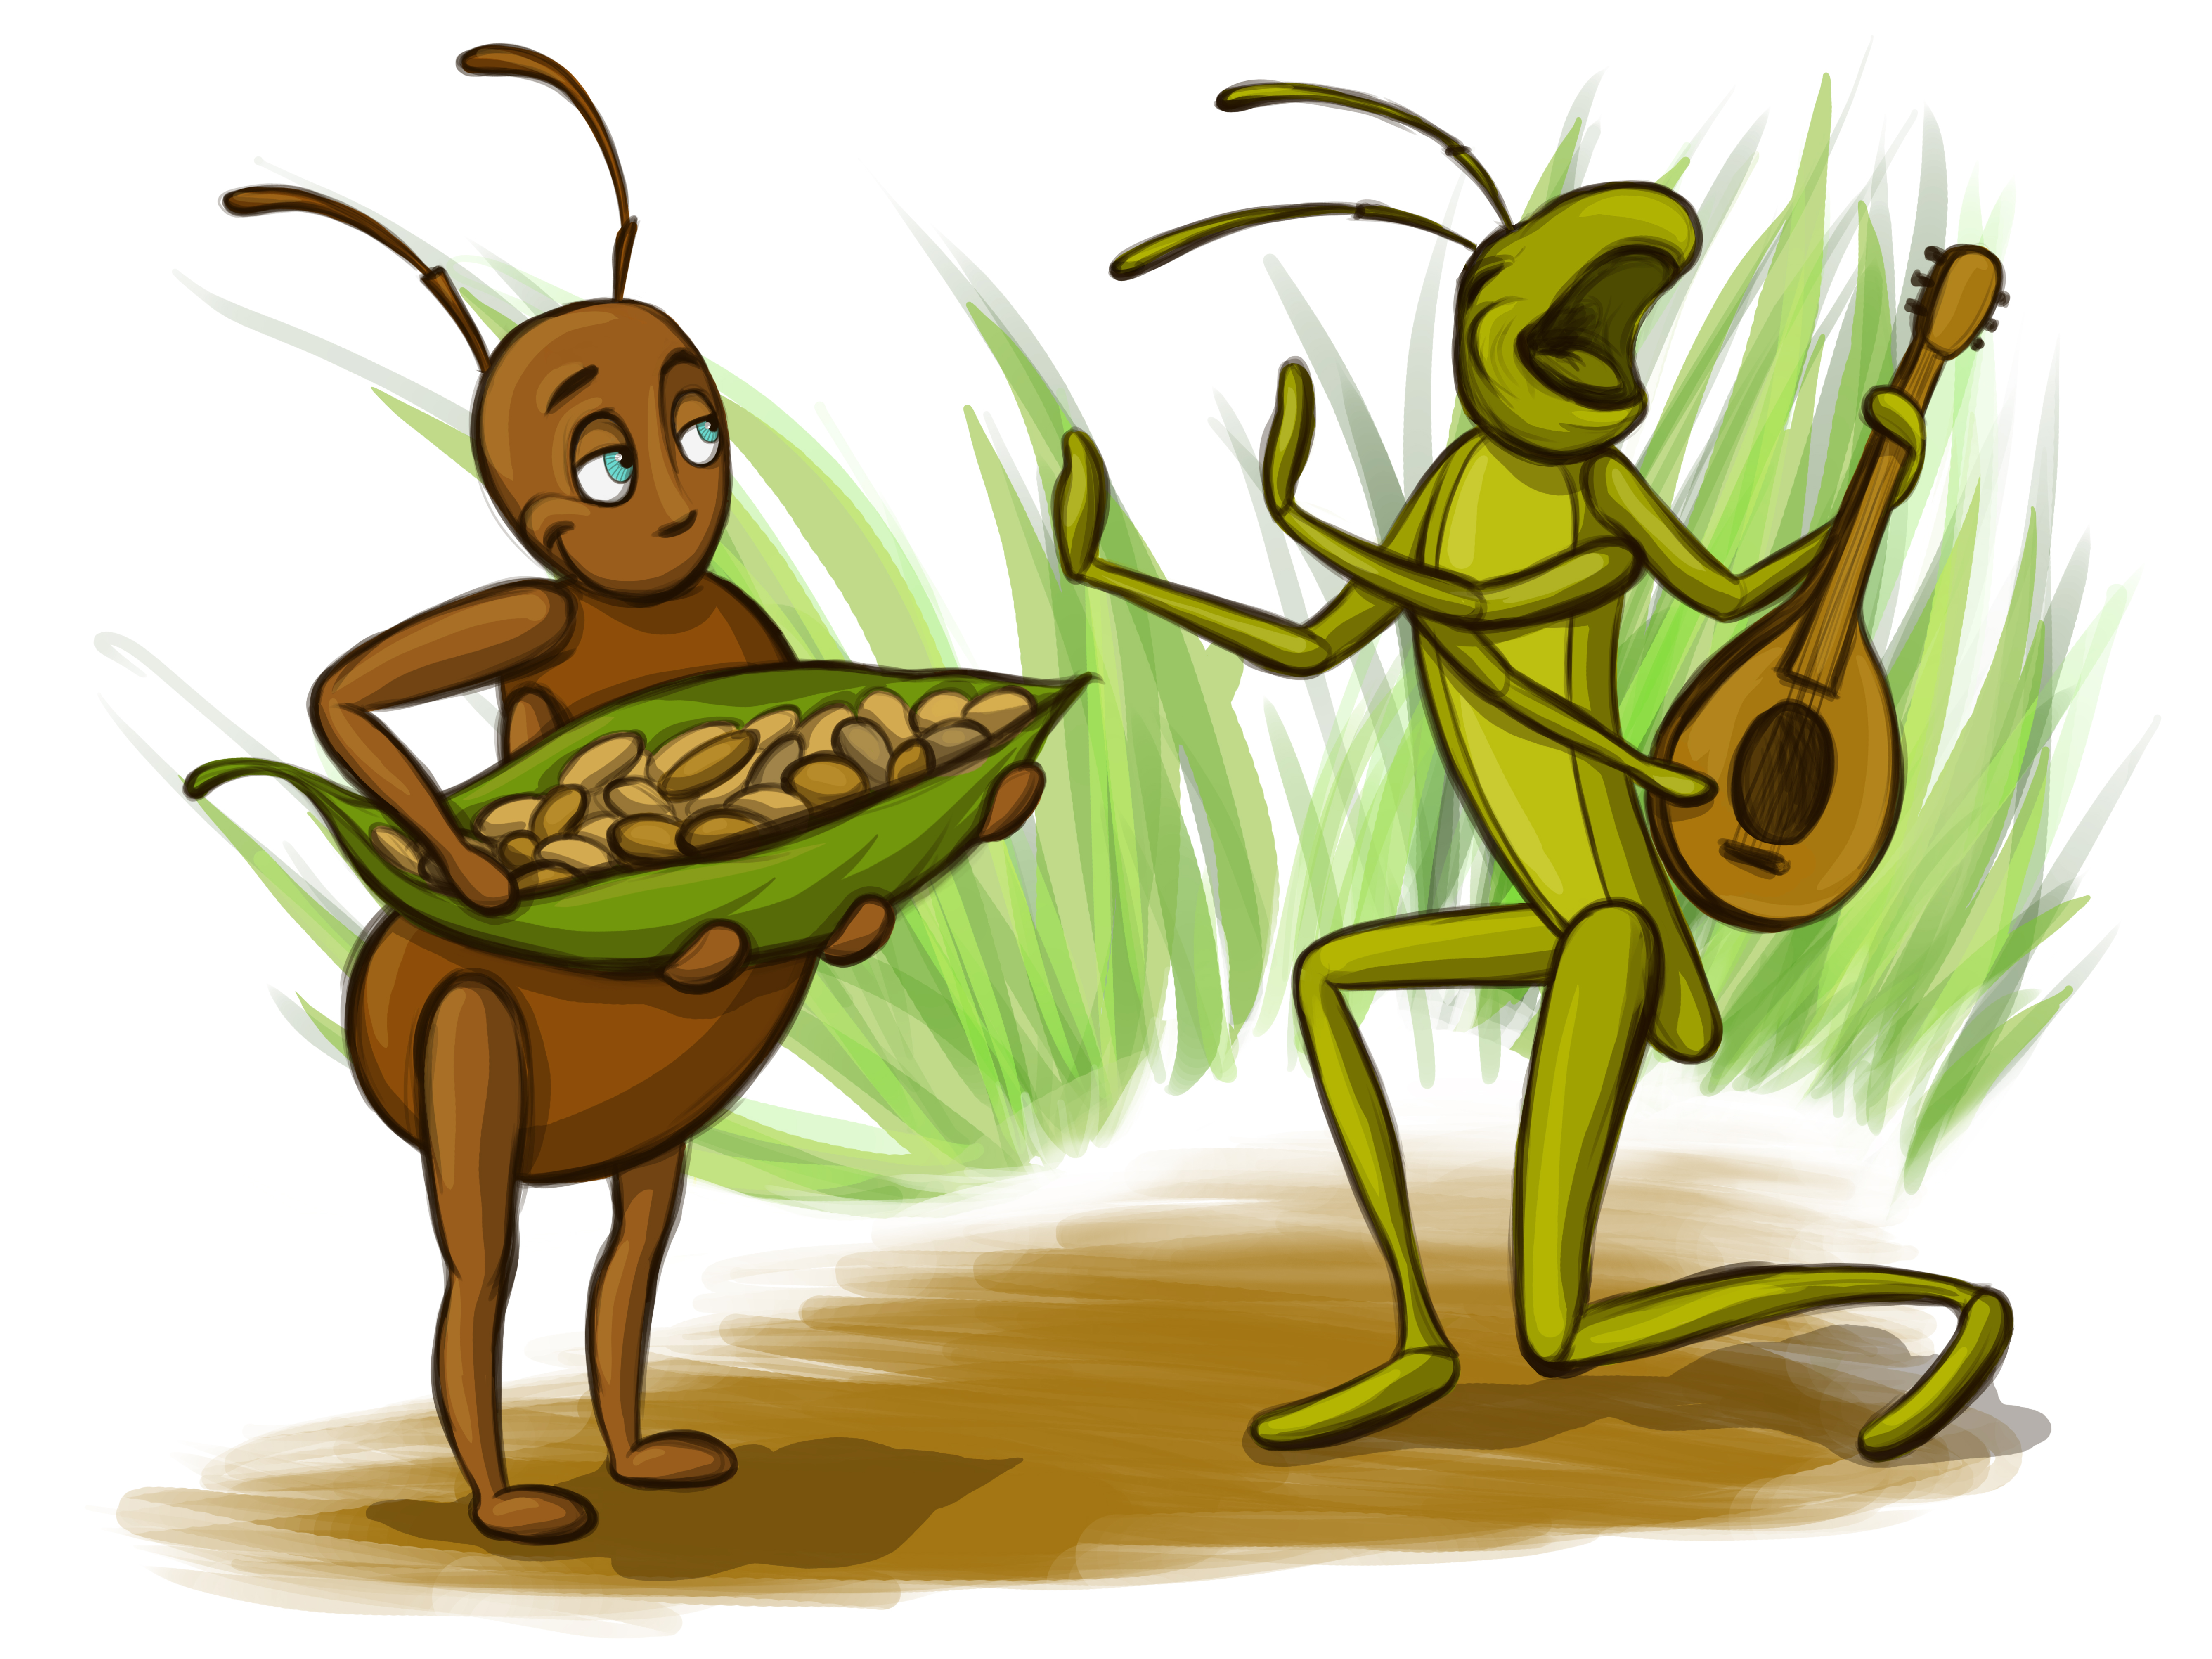 Grasshopper and the Ant by Adelya Tumasyeva at Coroflot.com.